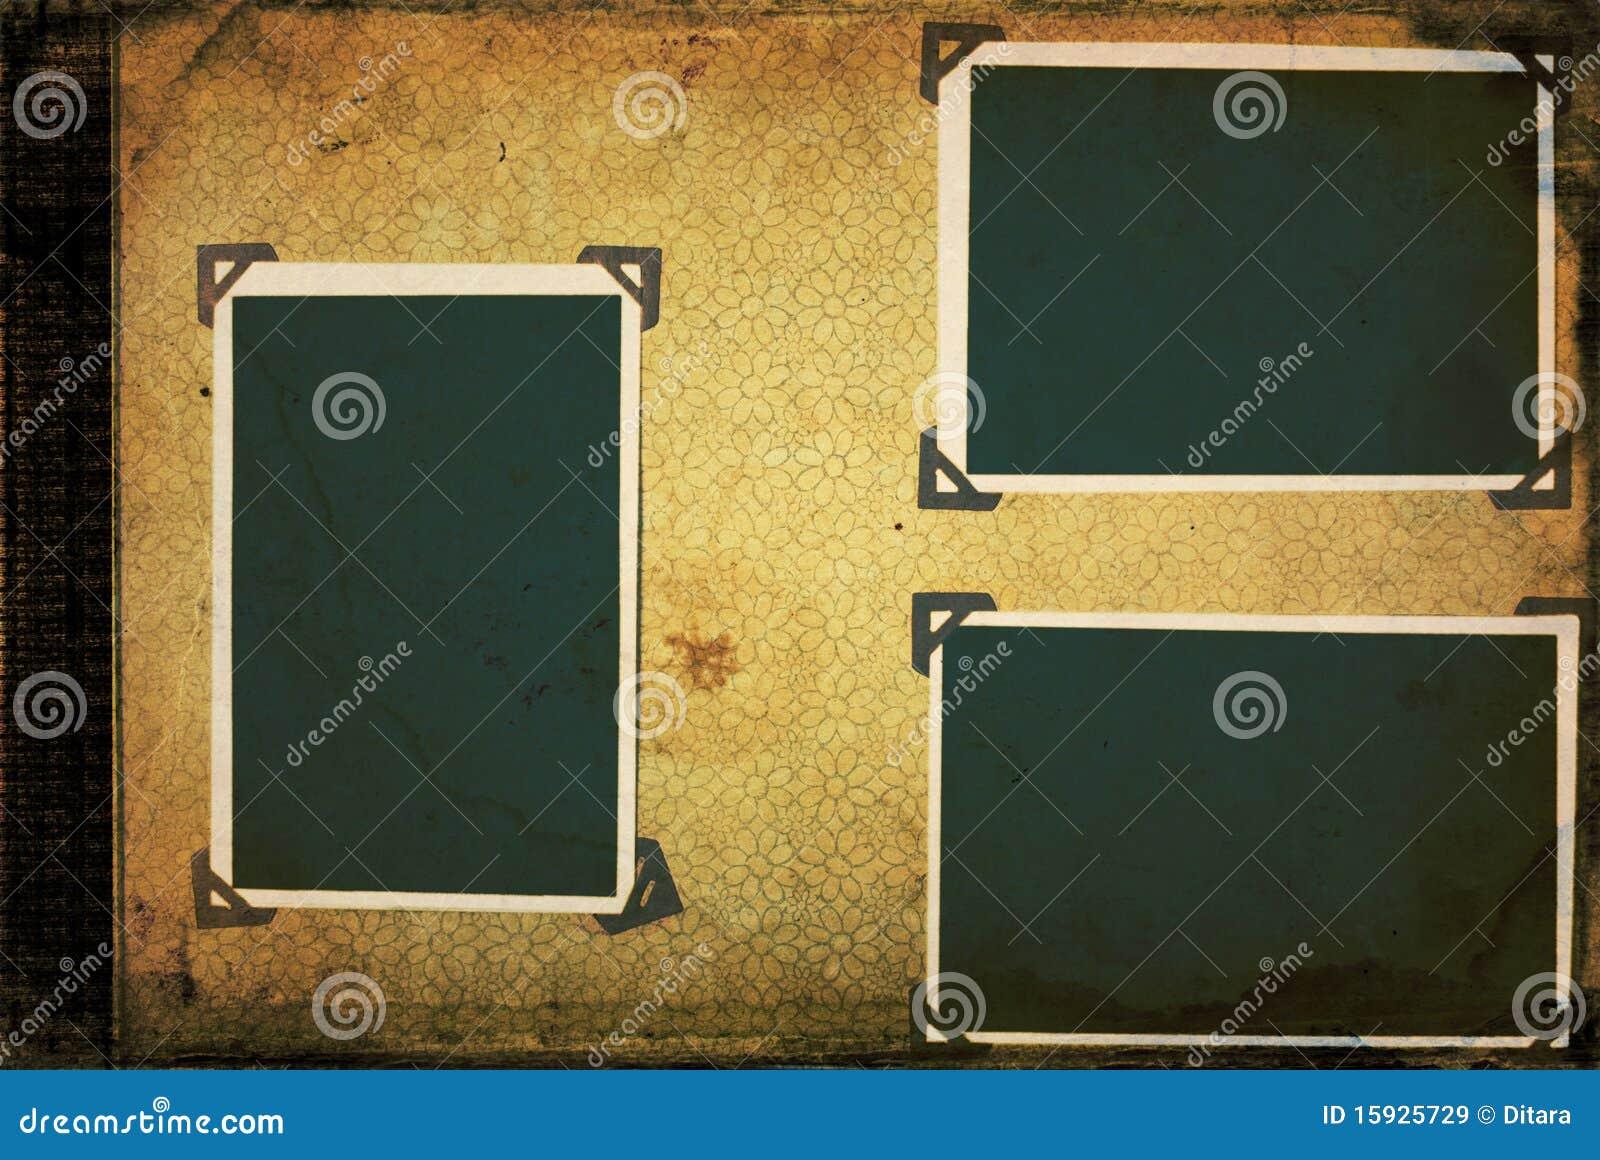 old photo album royalty free stock images image 15925729. Black Bedroom Furniture Sets. Home Design Ideas